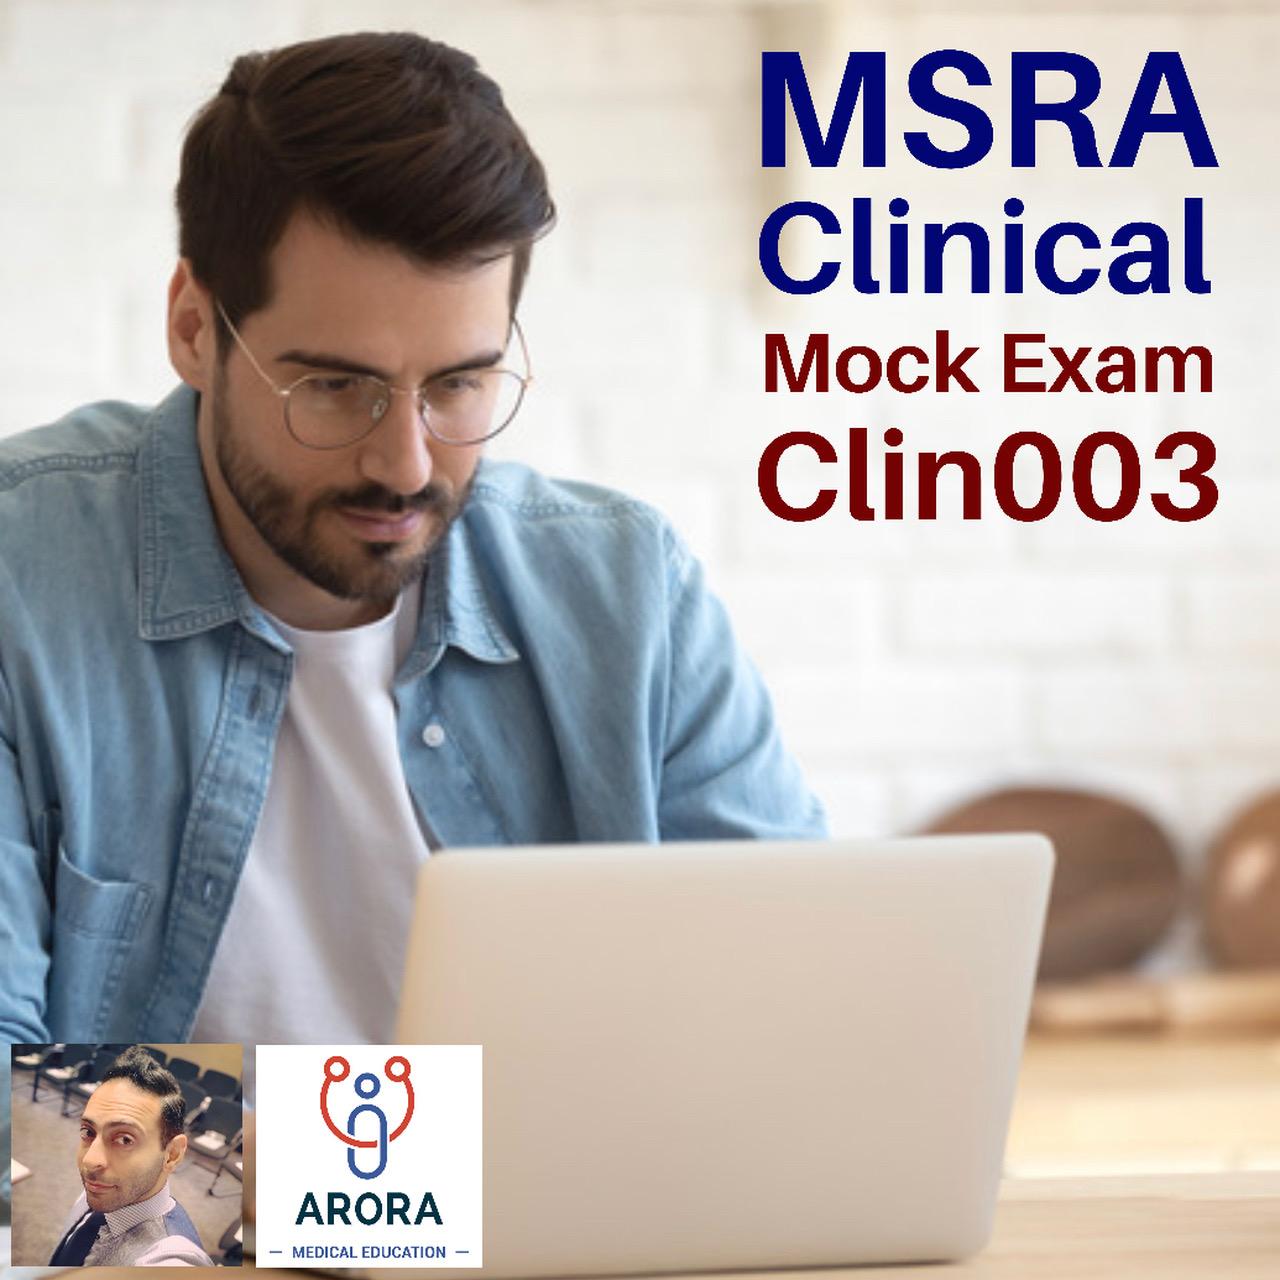 image0 - MRCGP CSA, AKT and PLAB Exam Courses and Online Webinars - Arora Medical Education